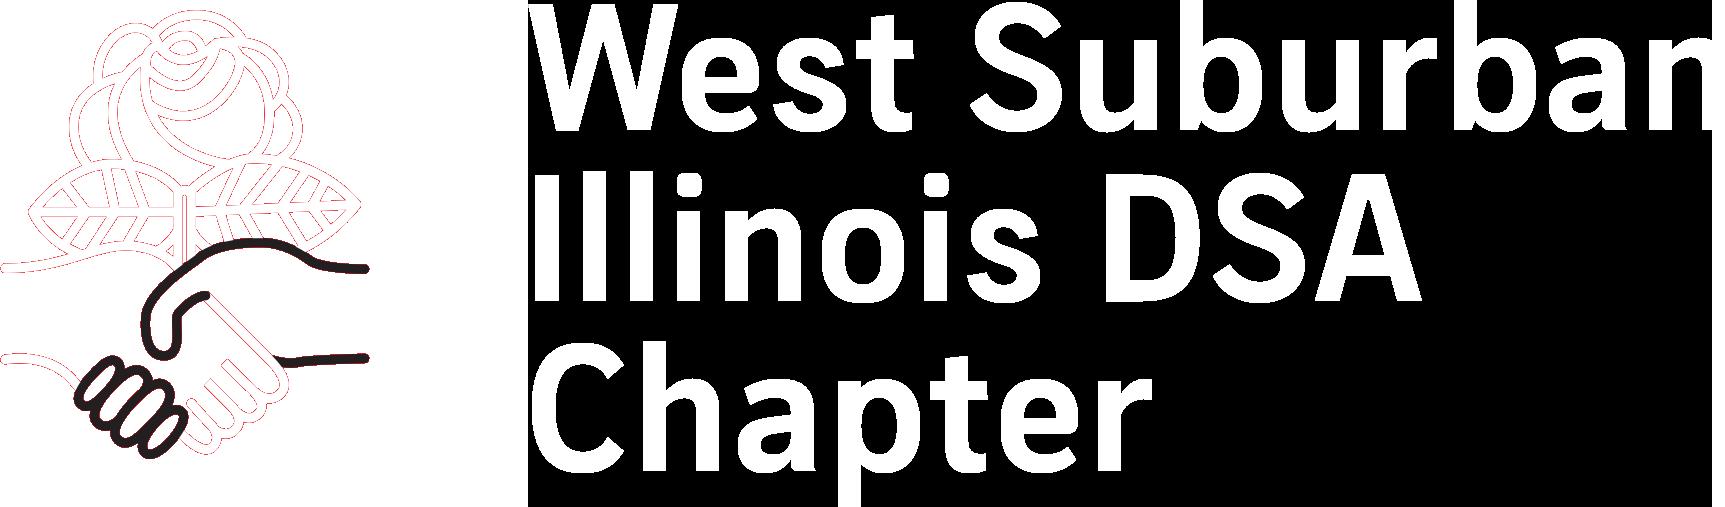 West Suburban Illinois DSA